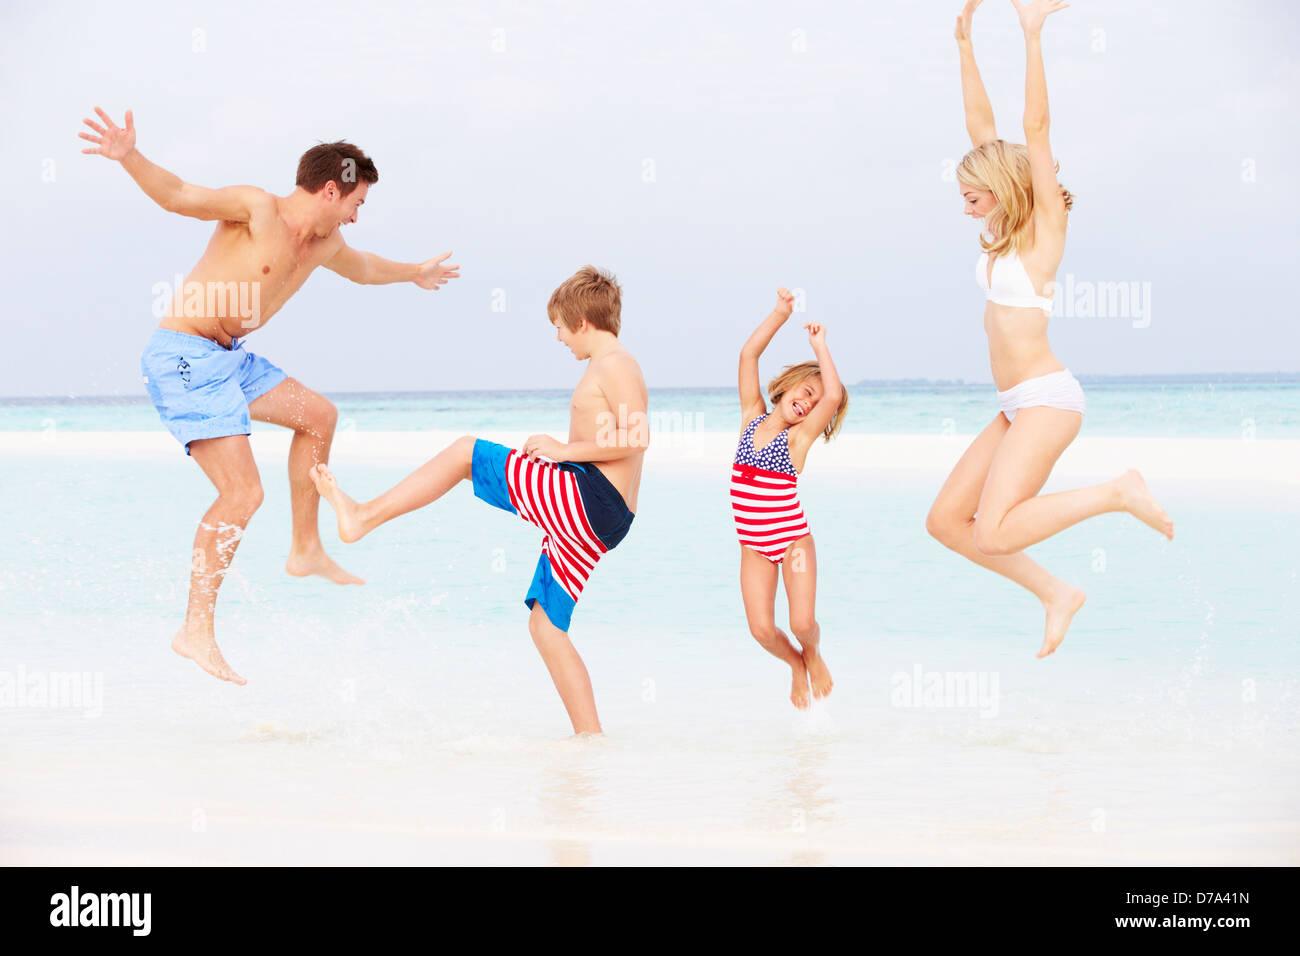 Family Having Fun In Sea On Beach Holiday - Stock Image